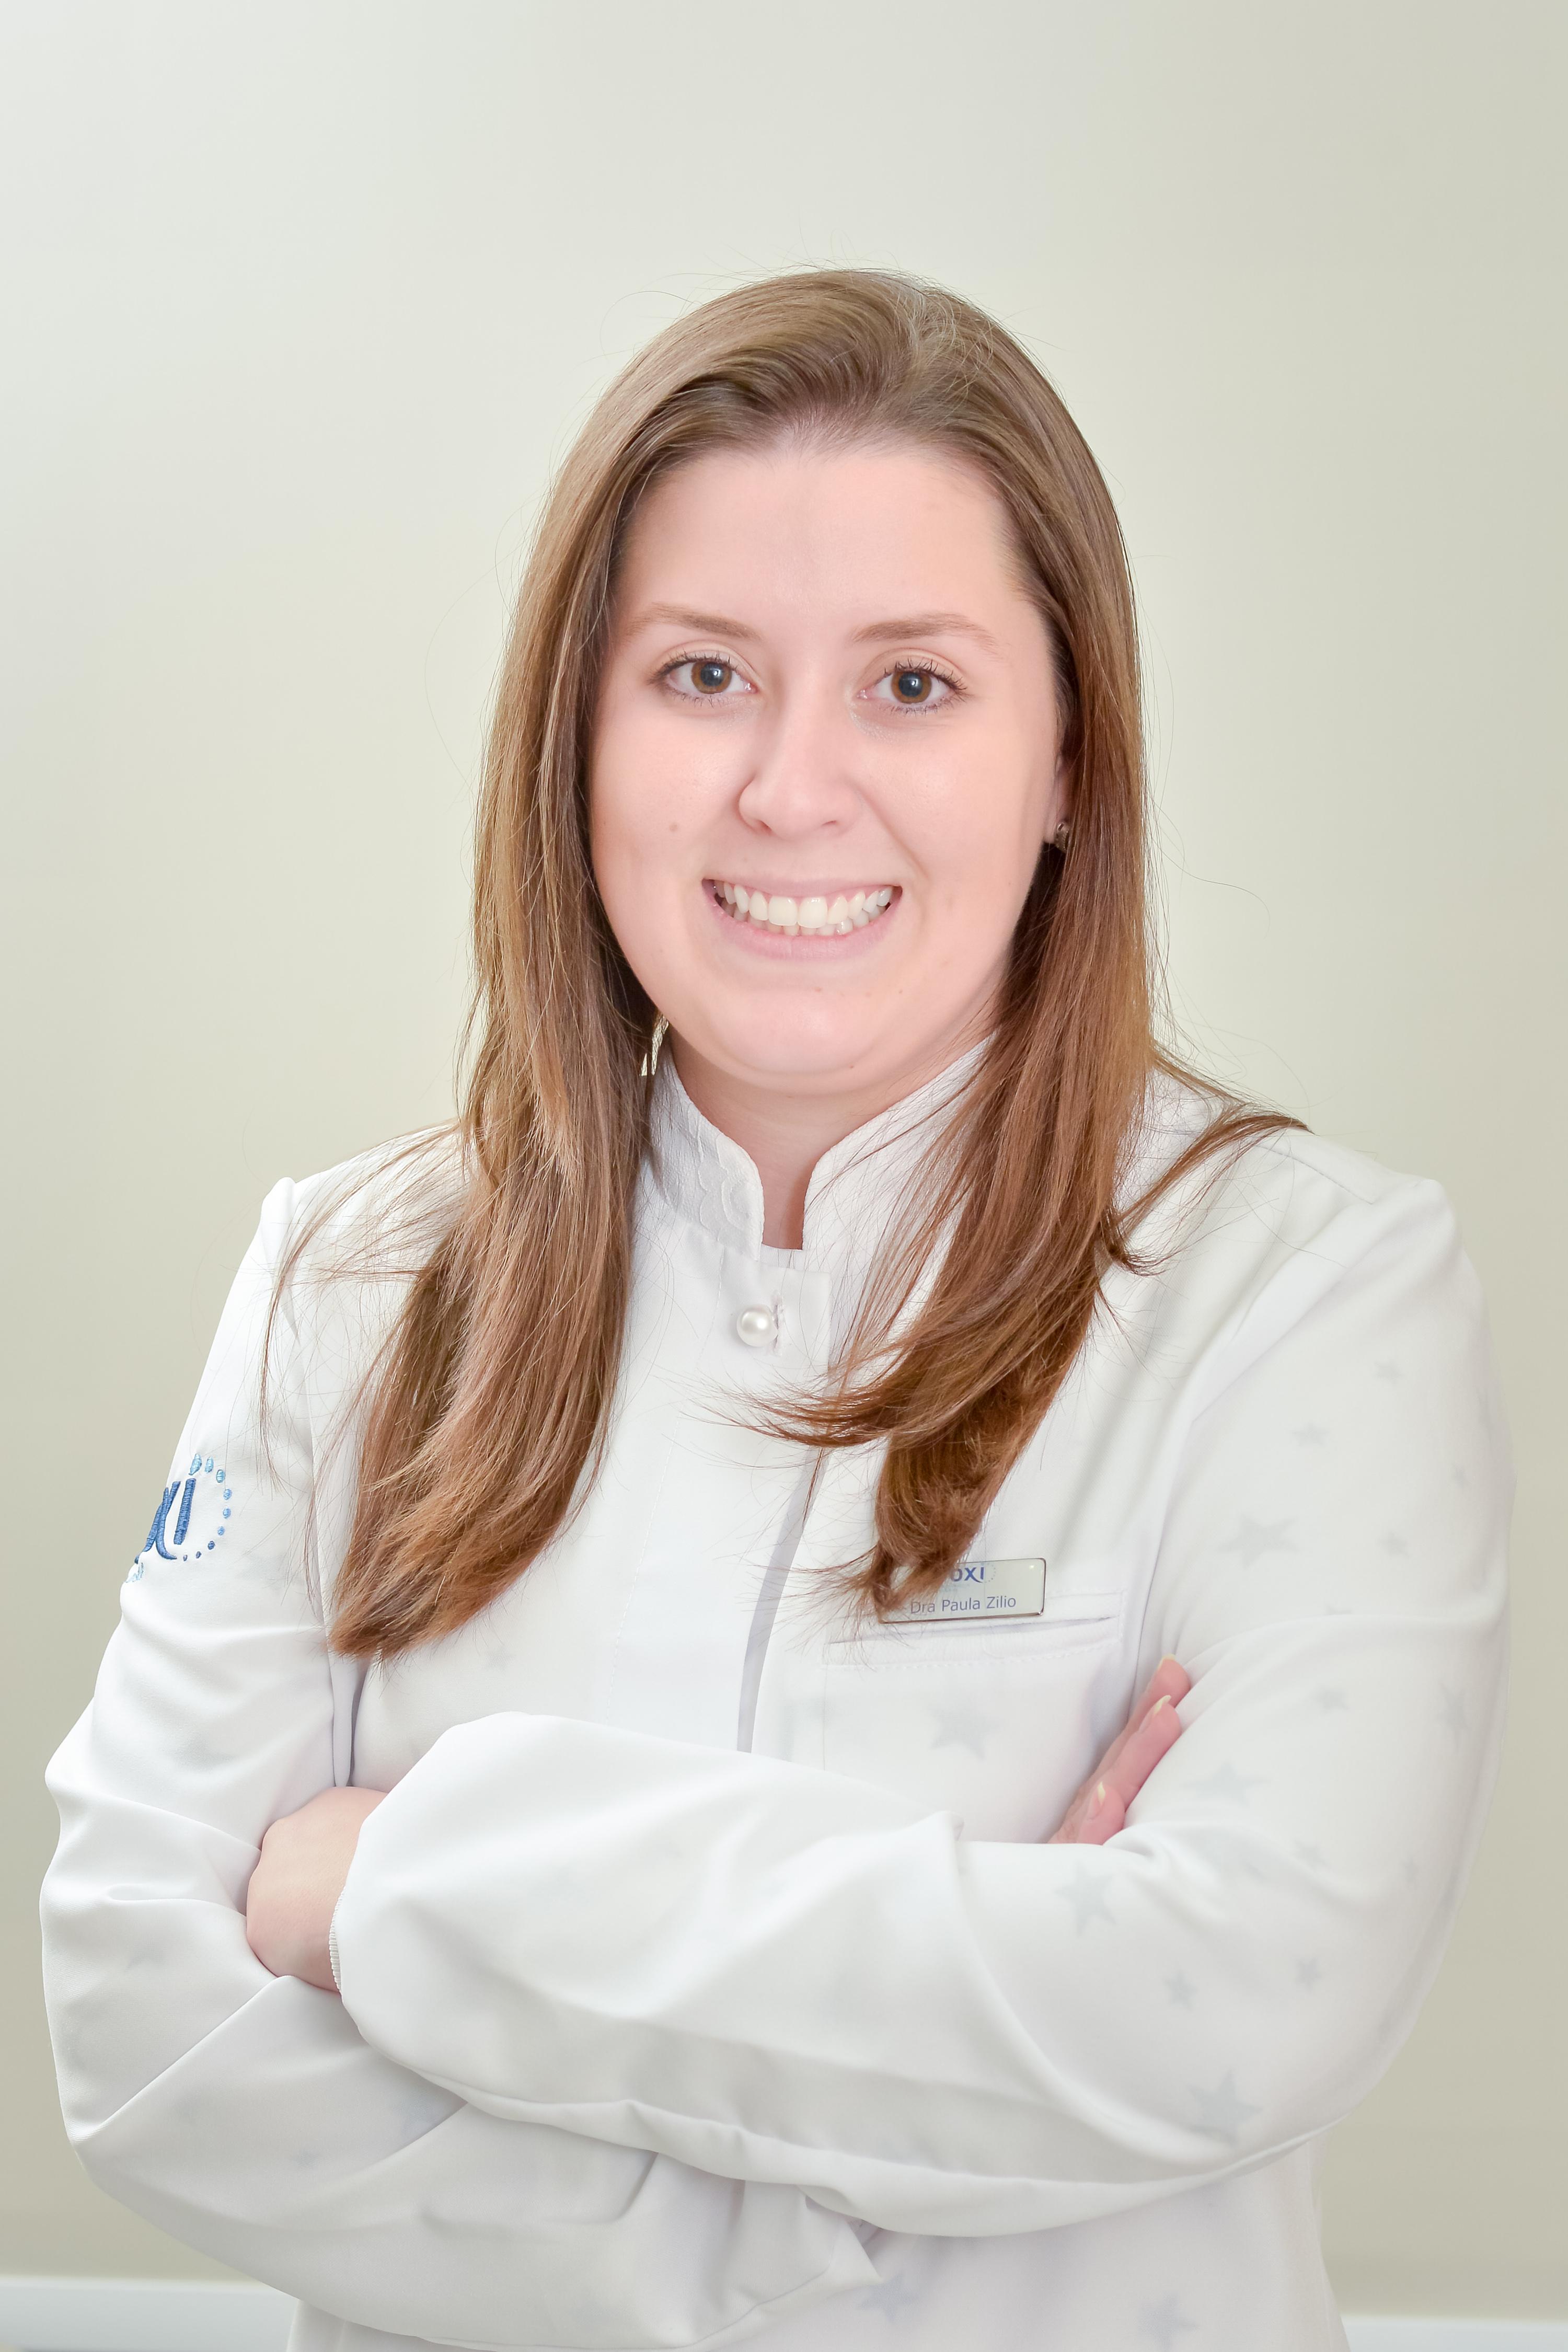 Dra. Gabriela Costa Menegat